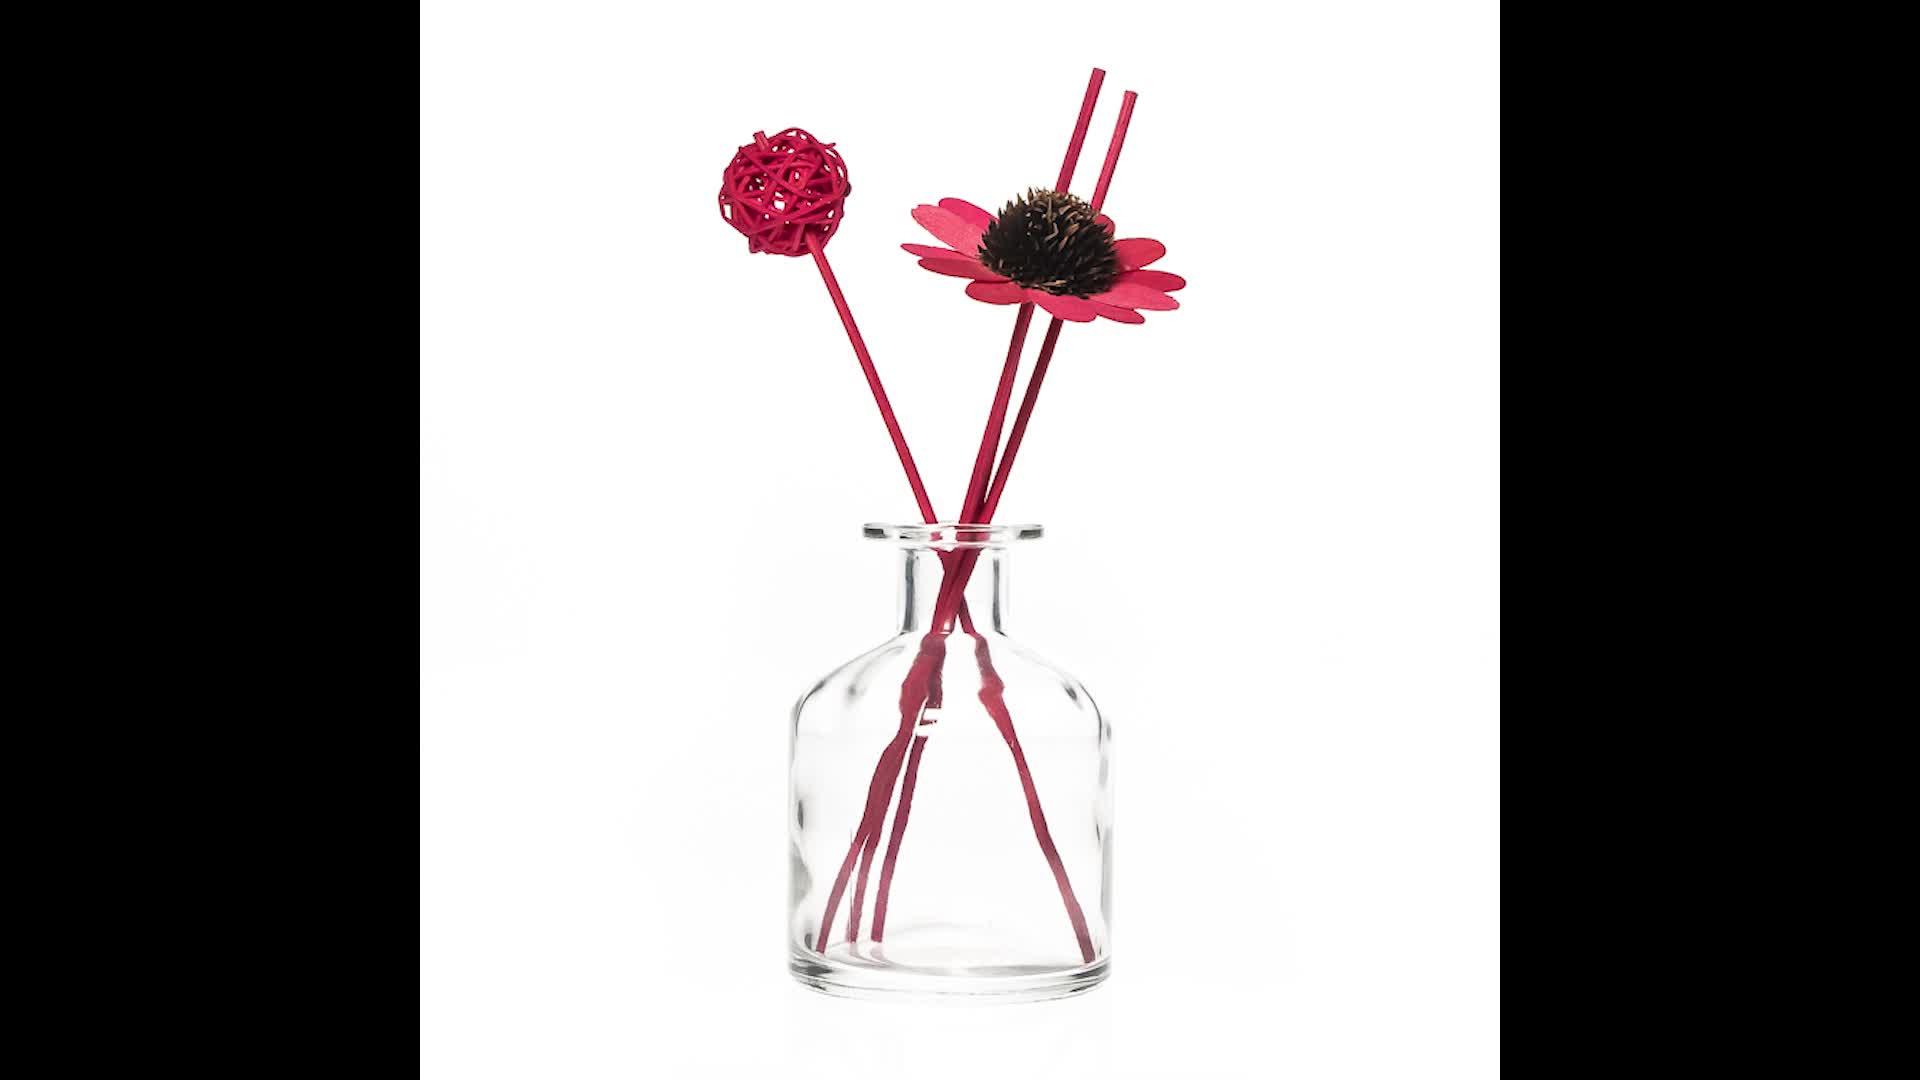 Zimmer Dekorative 50 ml Runde Leer Klare Glas Reed Diffusor Blume Vase Flasche